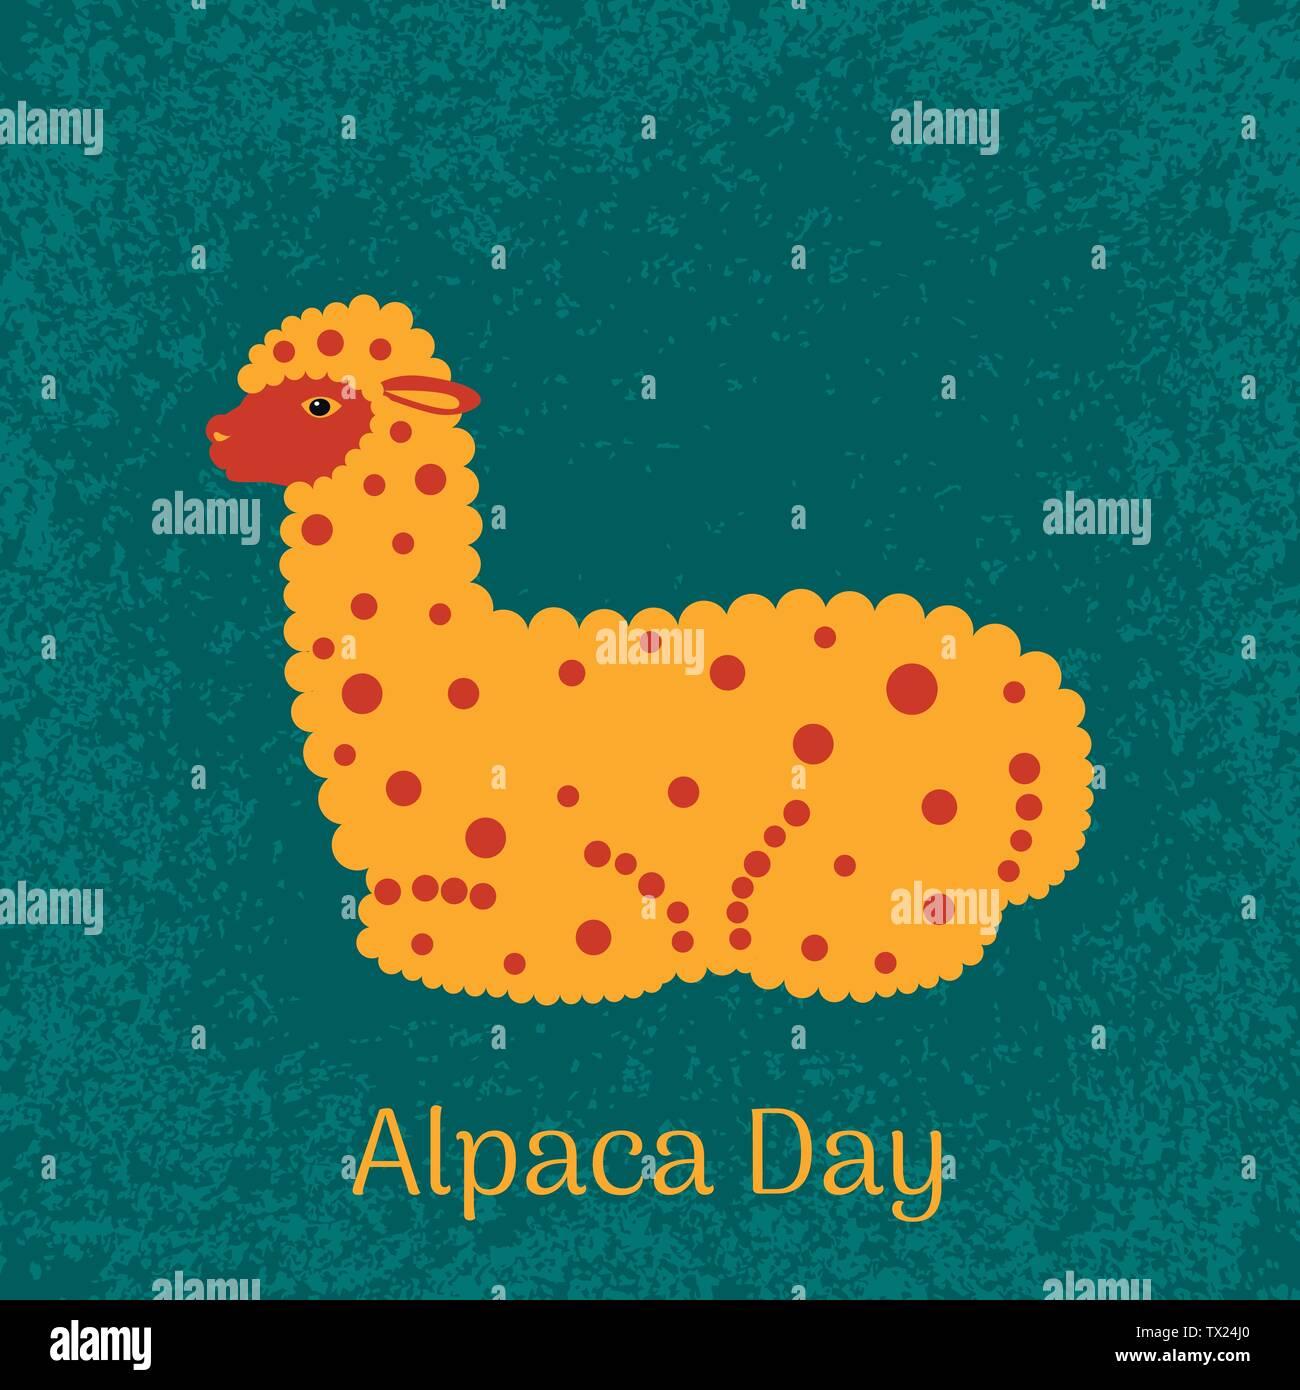 Alpaca Day. National holiday in Peru. Alpaca lies - Stock Vector